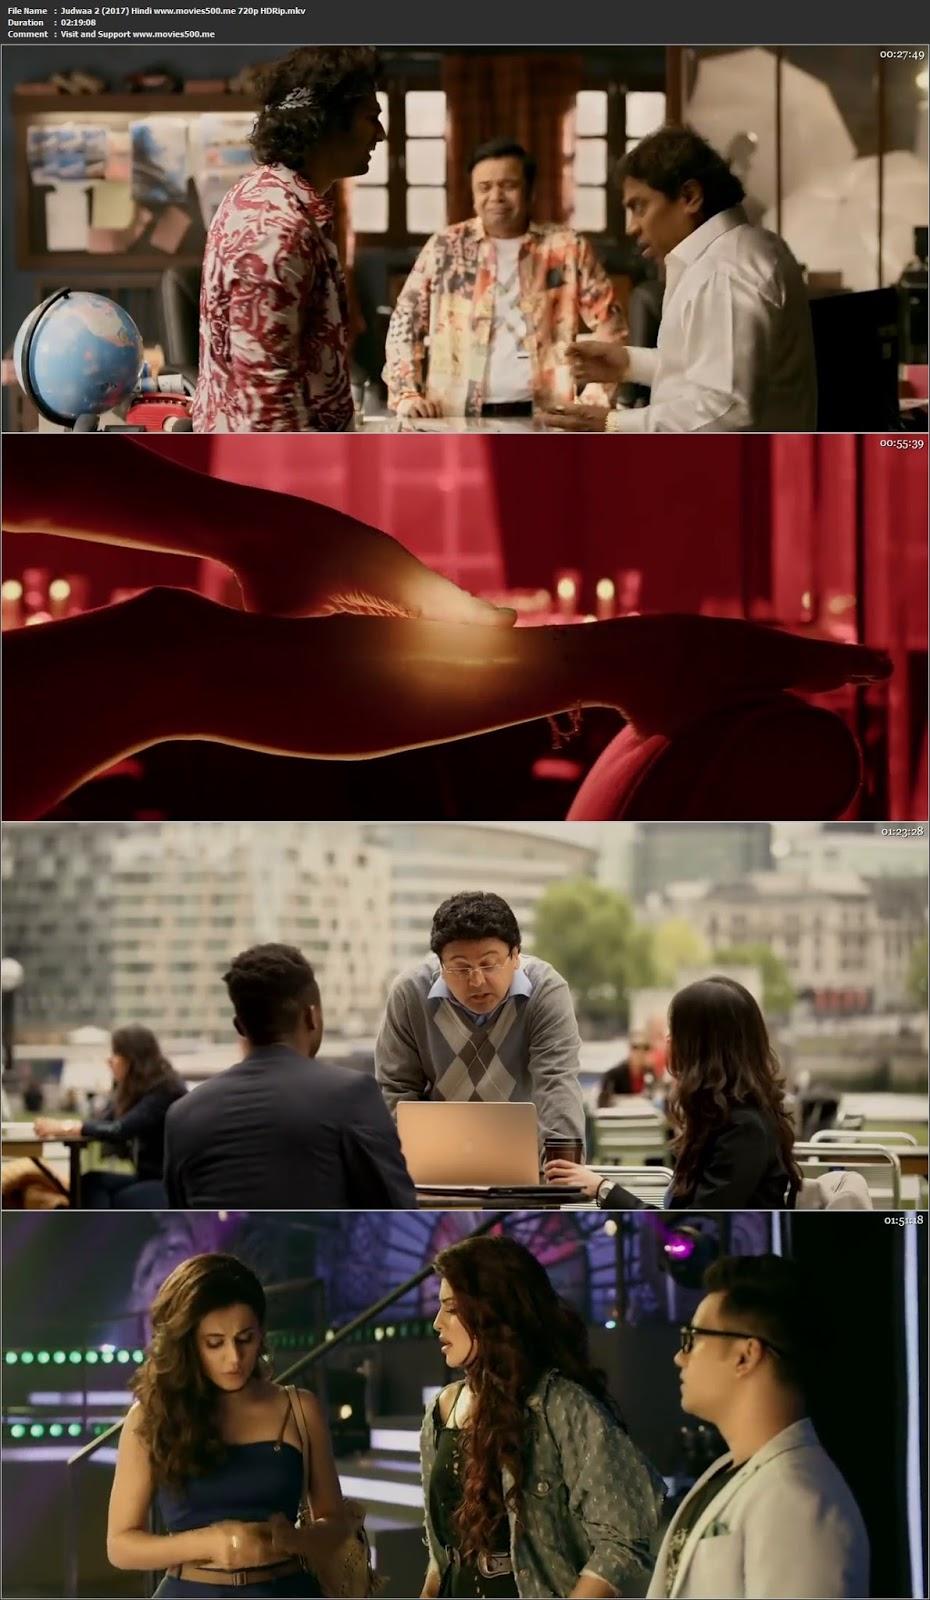 Judwaa 2 2017 Hindi Full Movie HDRip 720p 1GB at witleyapp.com